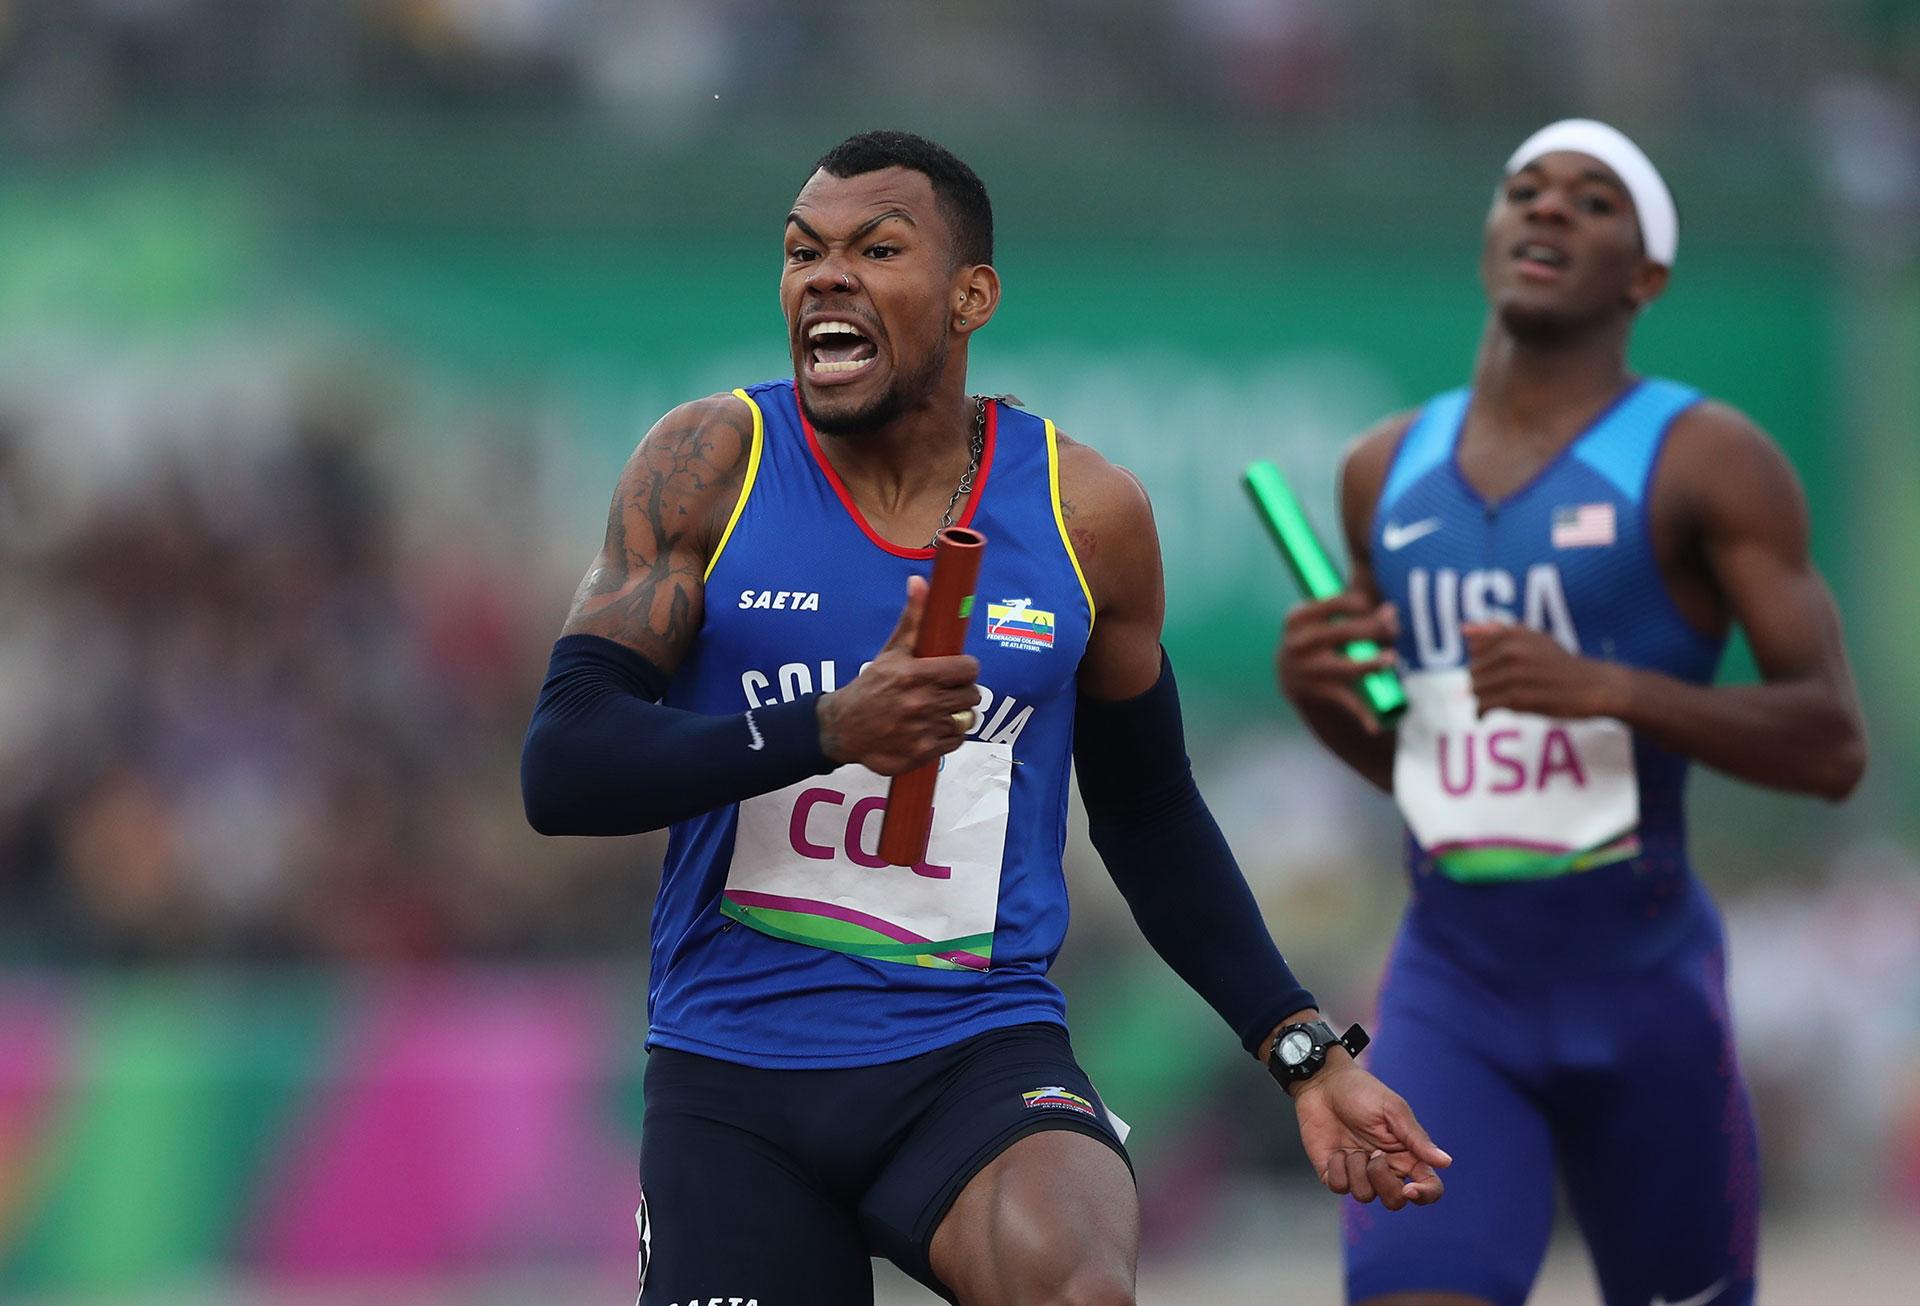 XVIII Pan American Games - Lima 2019 - Athletics - Men's 4x400m Relay Final - Athletics Stadium, Lima, Peru - August 10, 2019. Colombia's Anthony Zambrano celebrates the team's gold medal finish. REUTERS/Ivan Alvarado